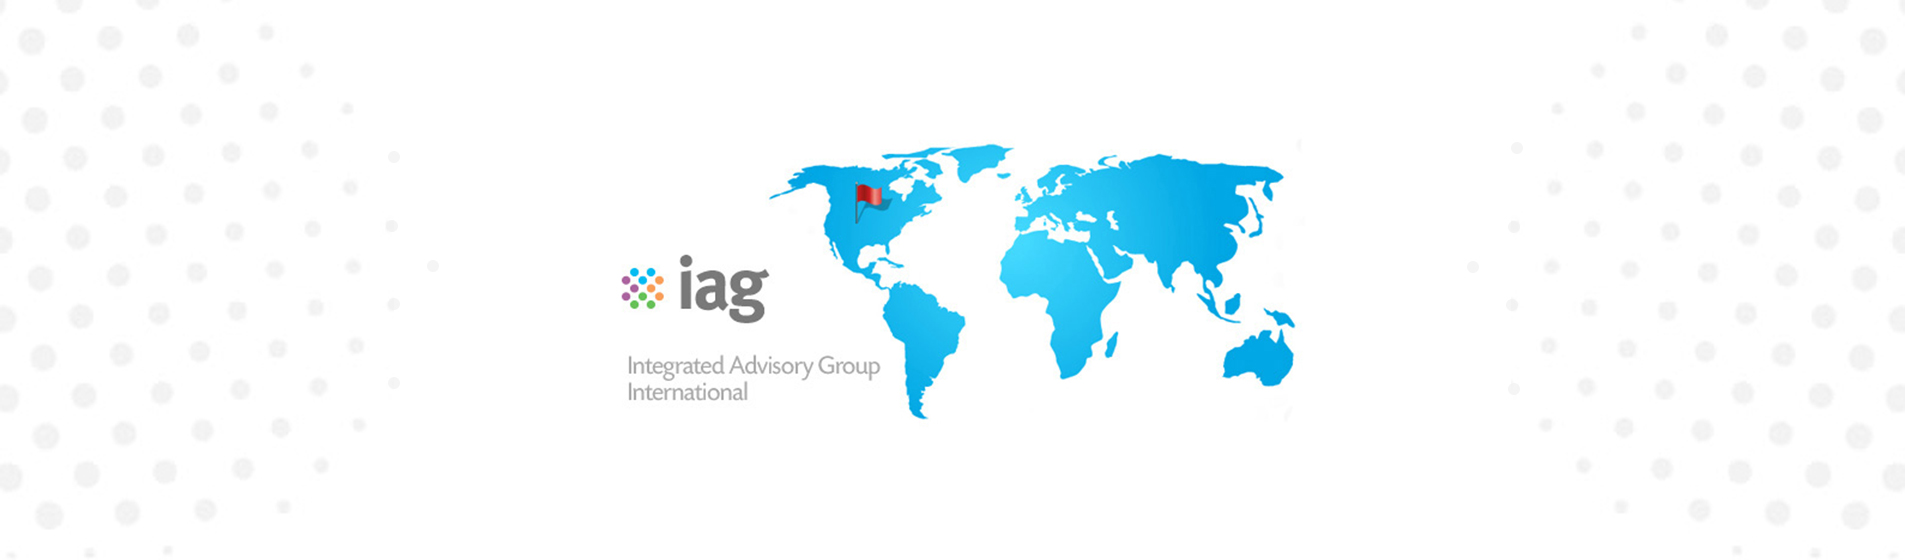 iag_nordamerika